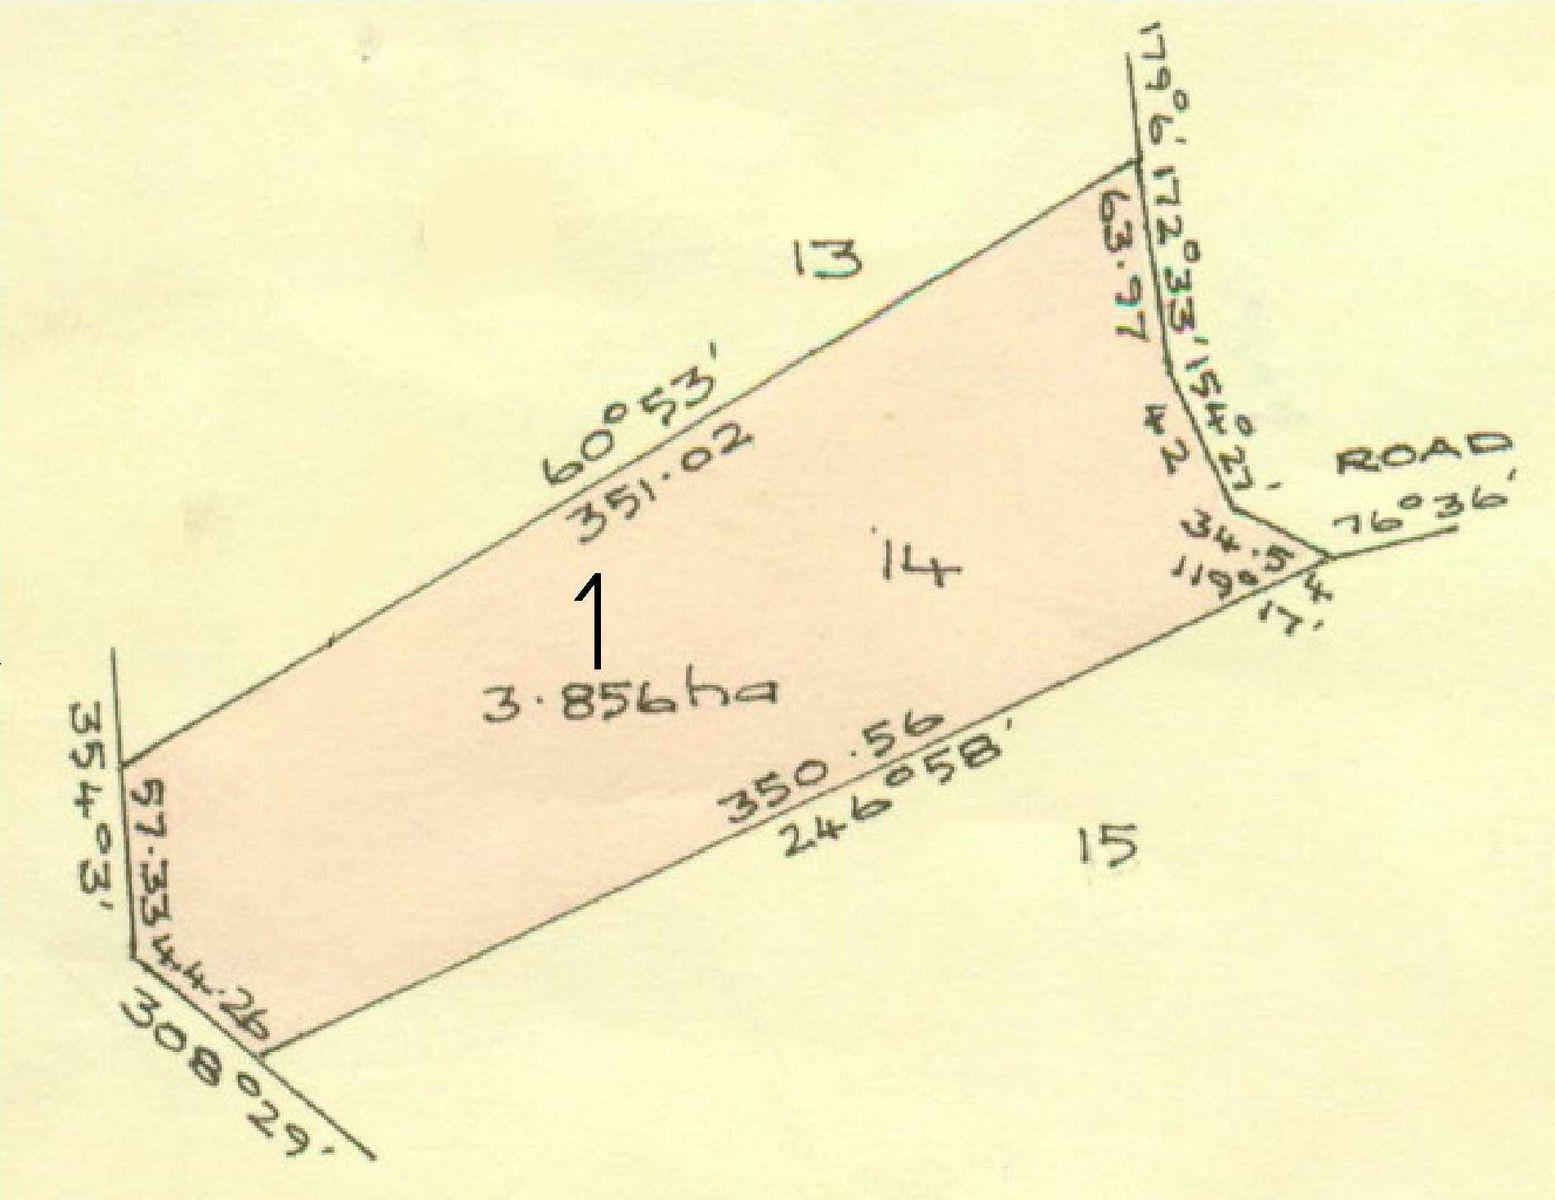 Lot 1 Borchardt Street, Guys Hill, VIC 3807